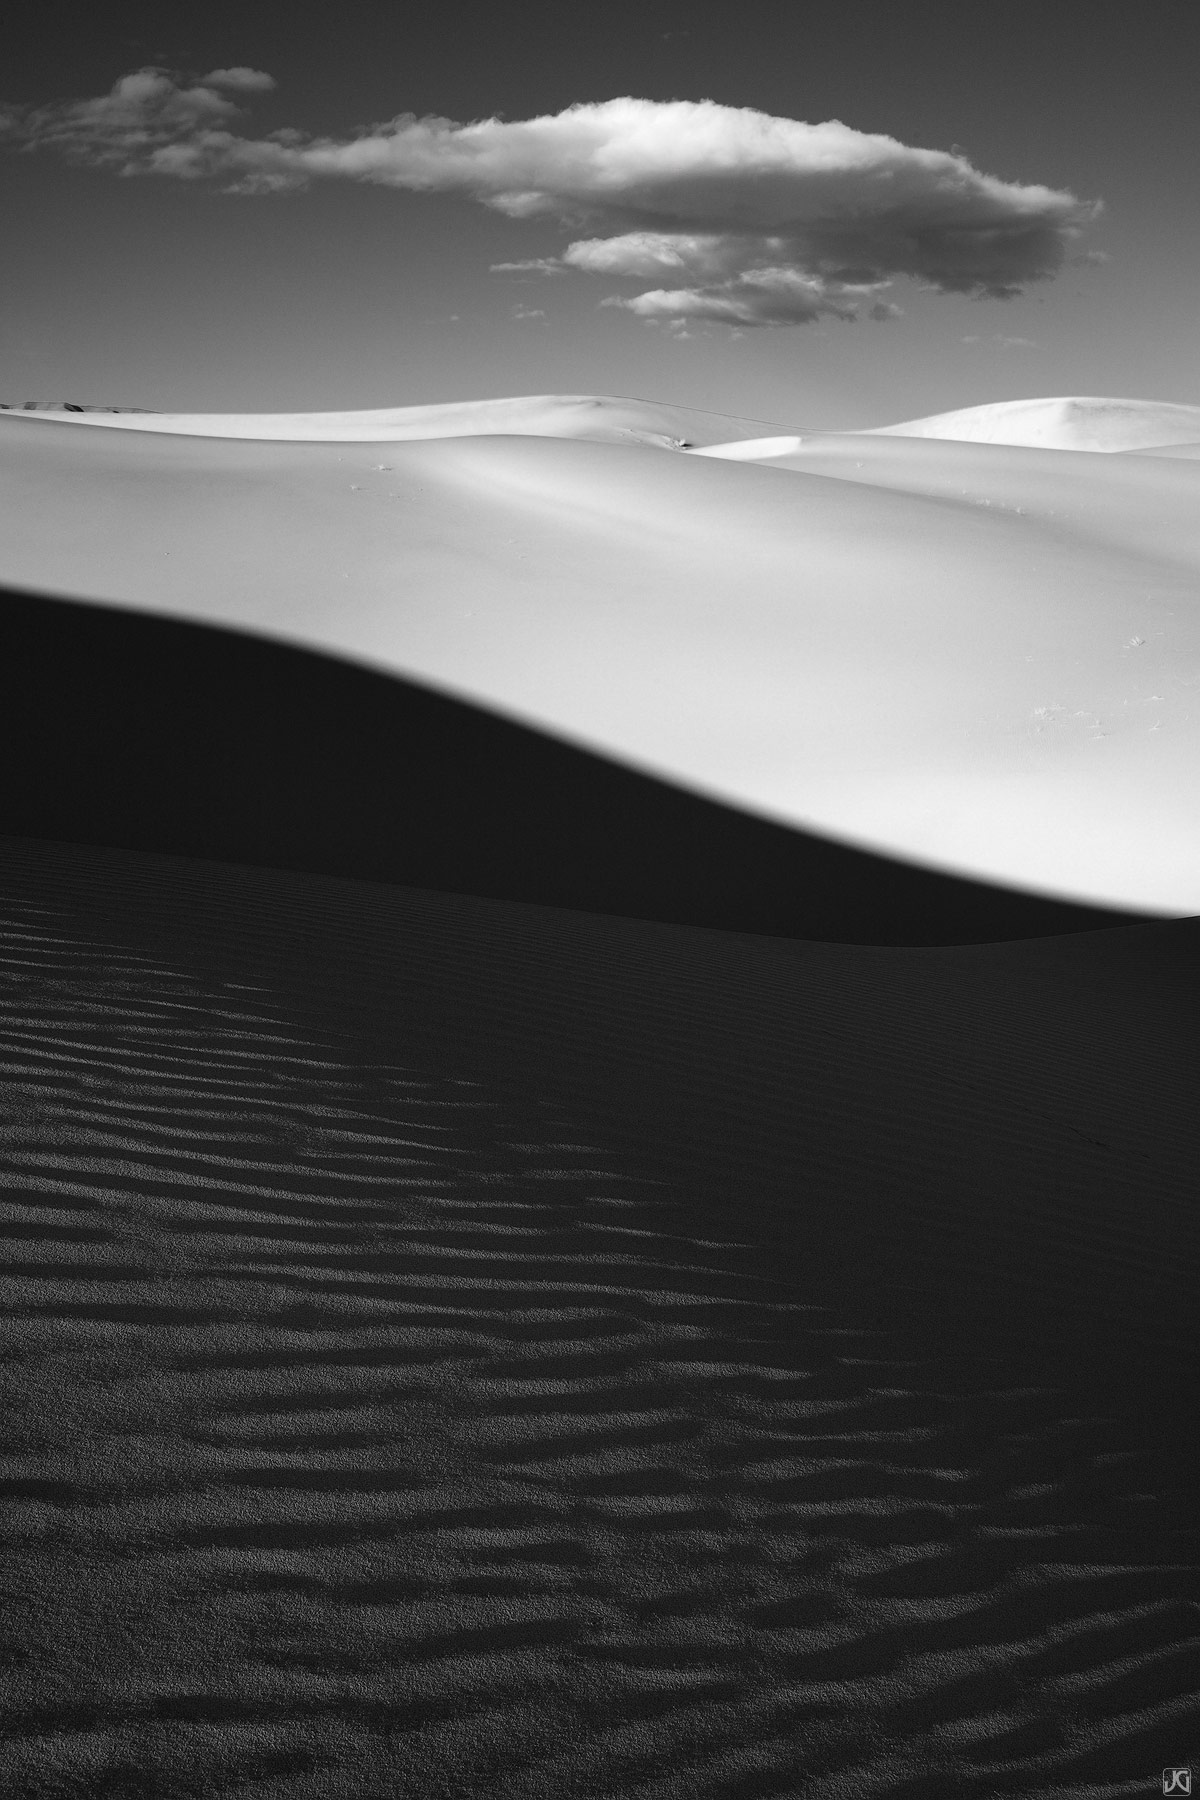 sand, dune, cloud, Death Valley, photo